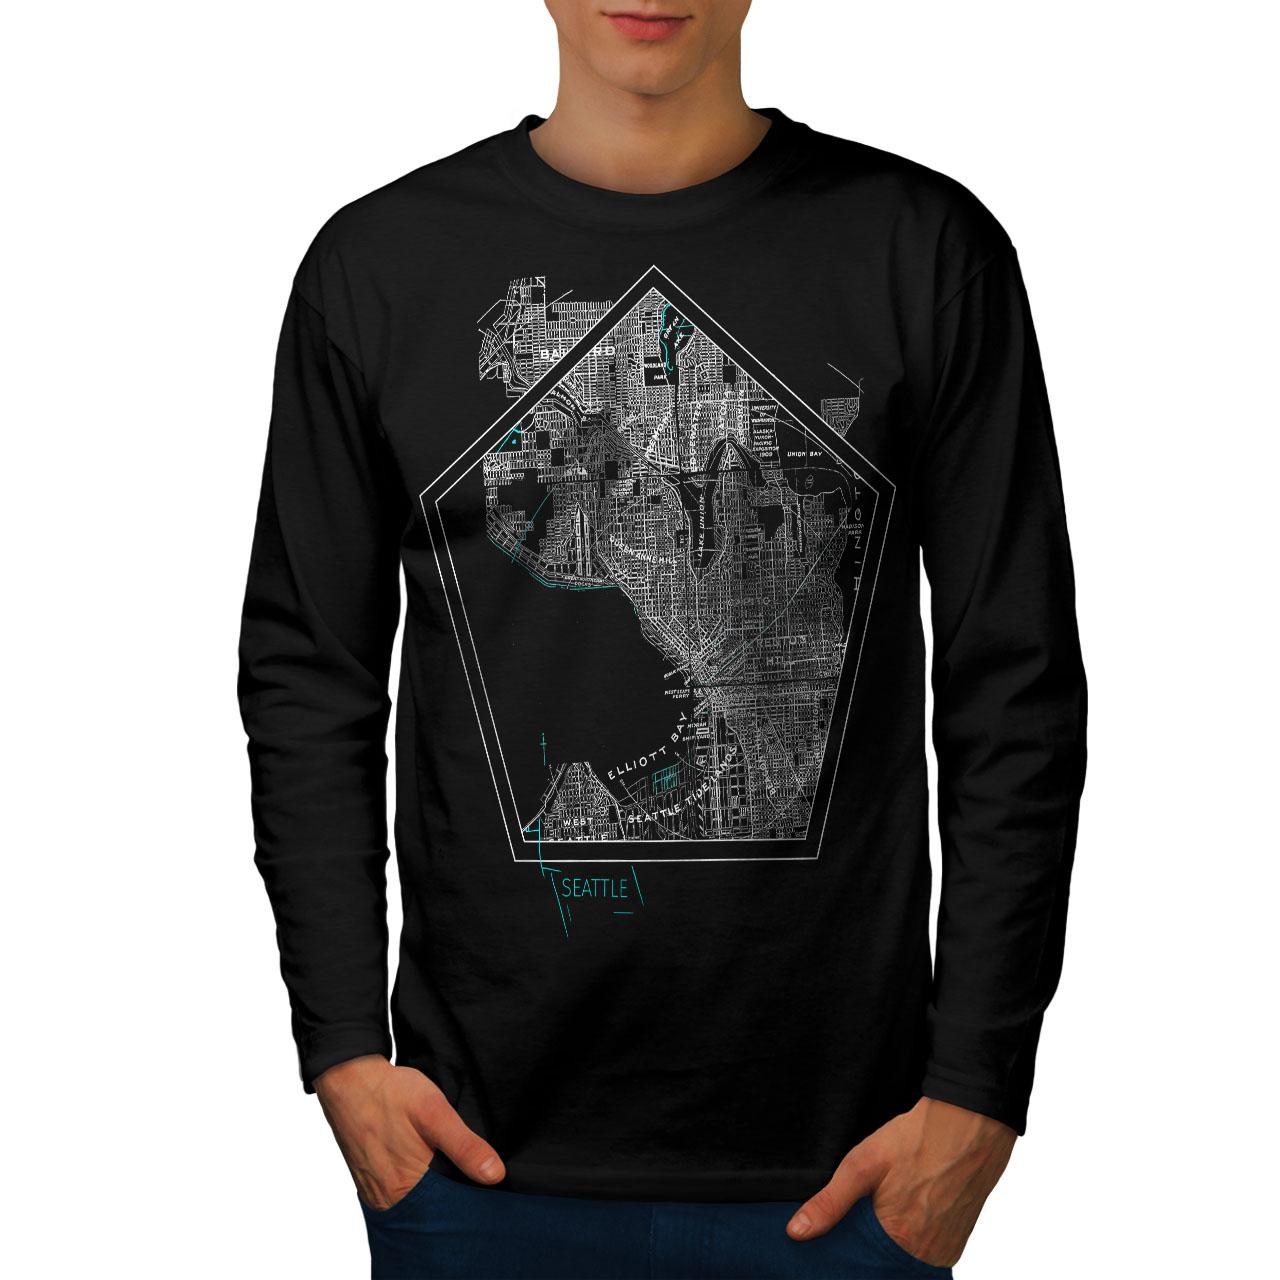 Town Casual Design Wellcoda America City Seattle Womens Long Sleeve T-shirt